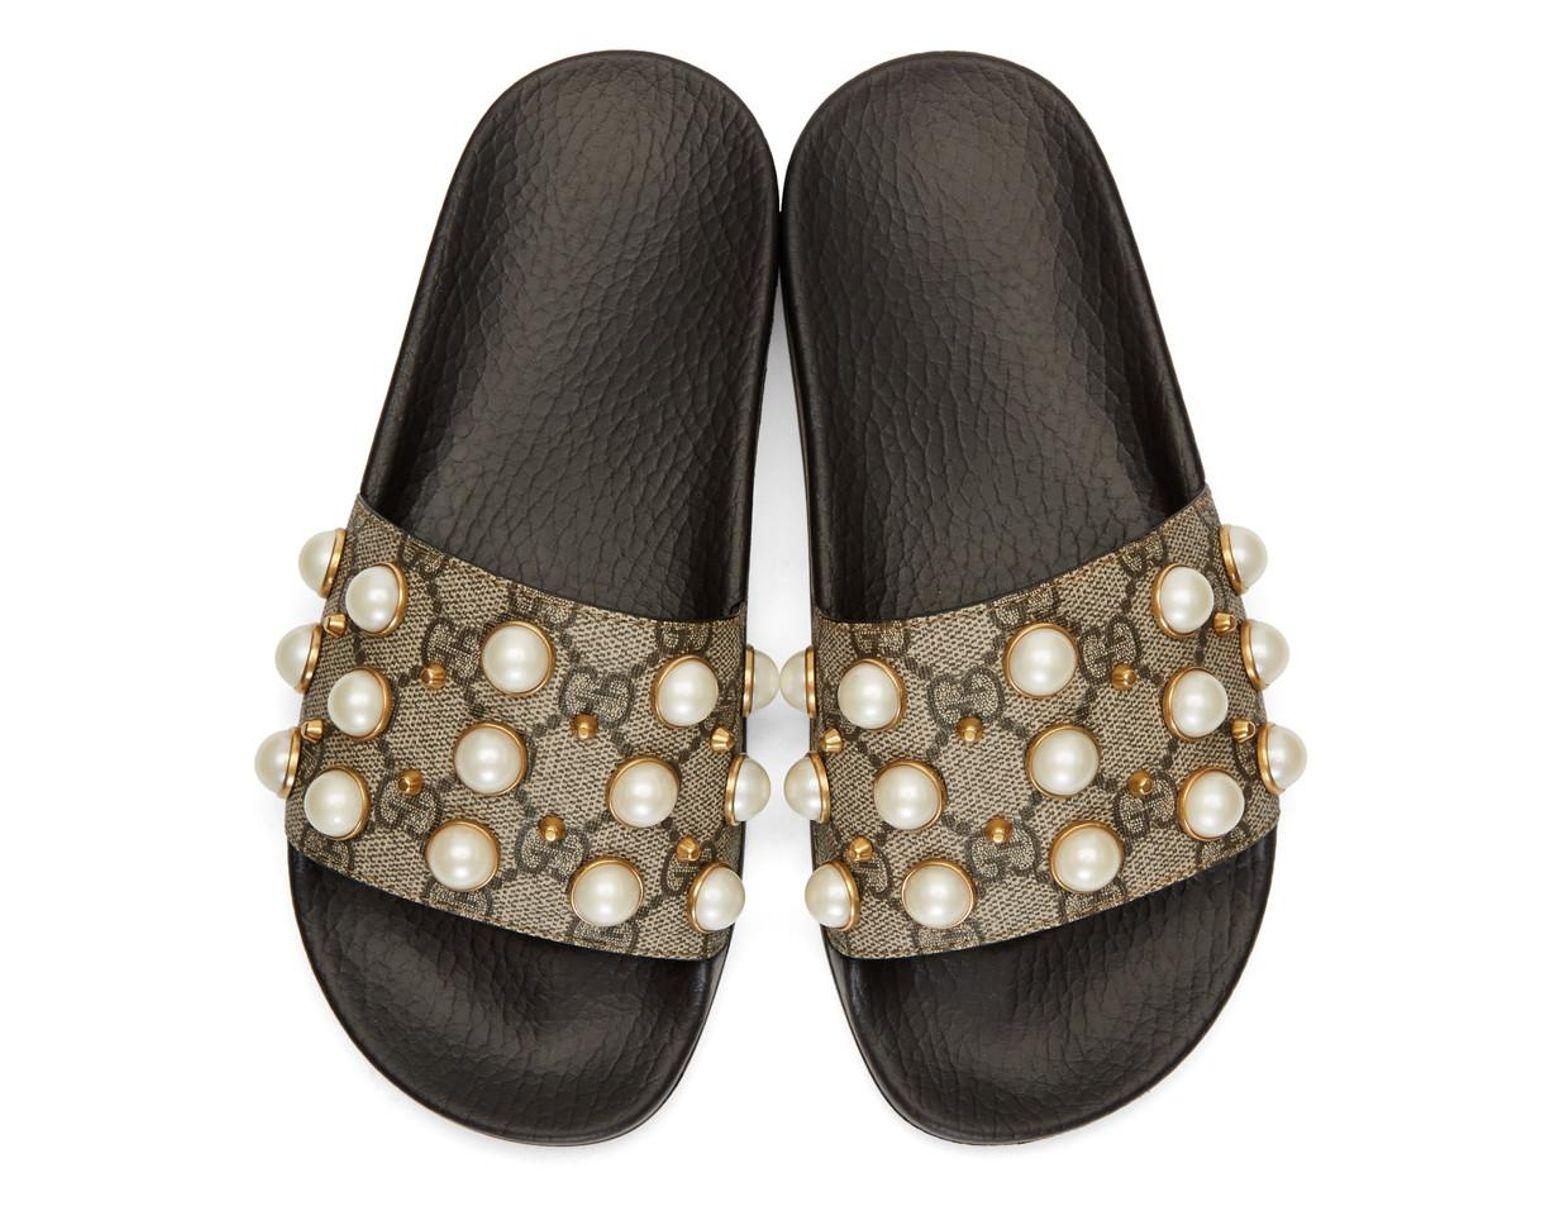 c66c8c819 Gucci Beige GG Supreme Pearls Pursuit Slides in Natural - Save 15% - Lyst